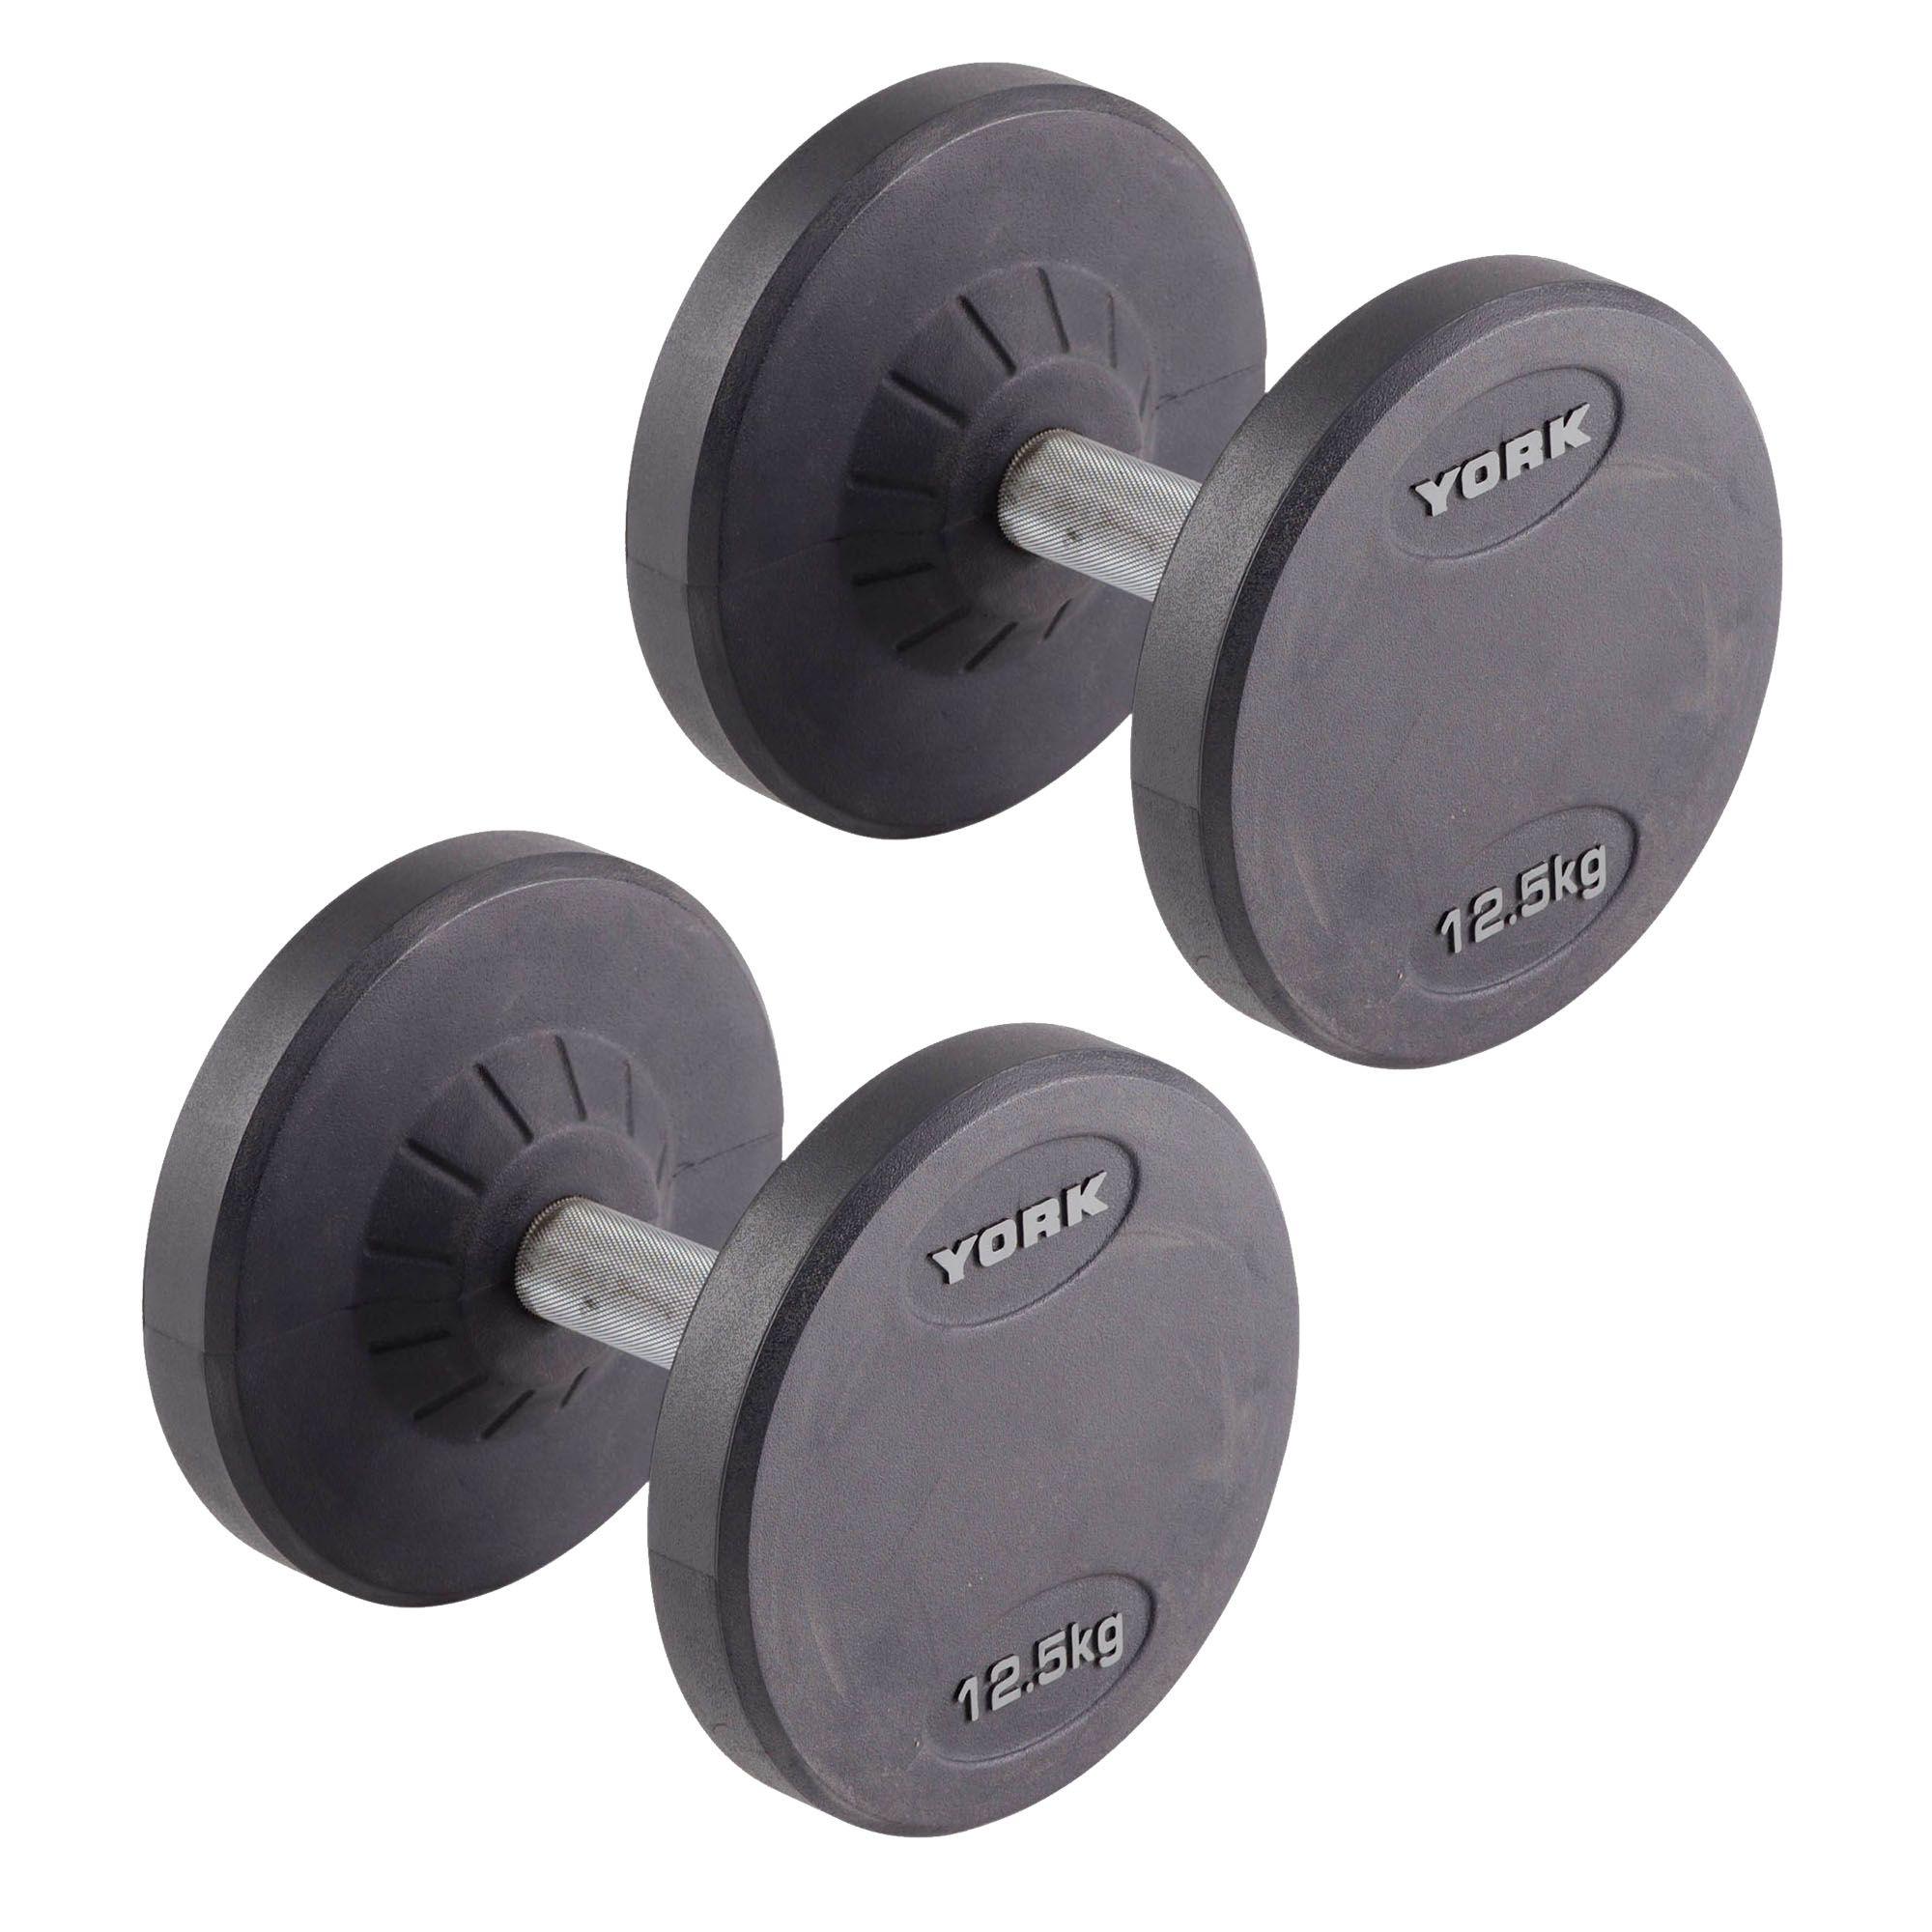 York 2 X 12.5kg Pro-Style Dumbbells